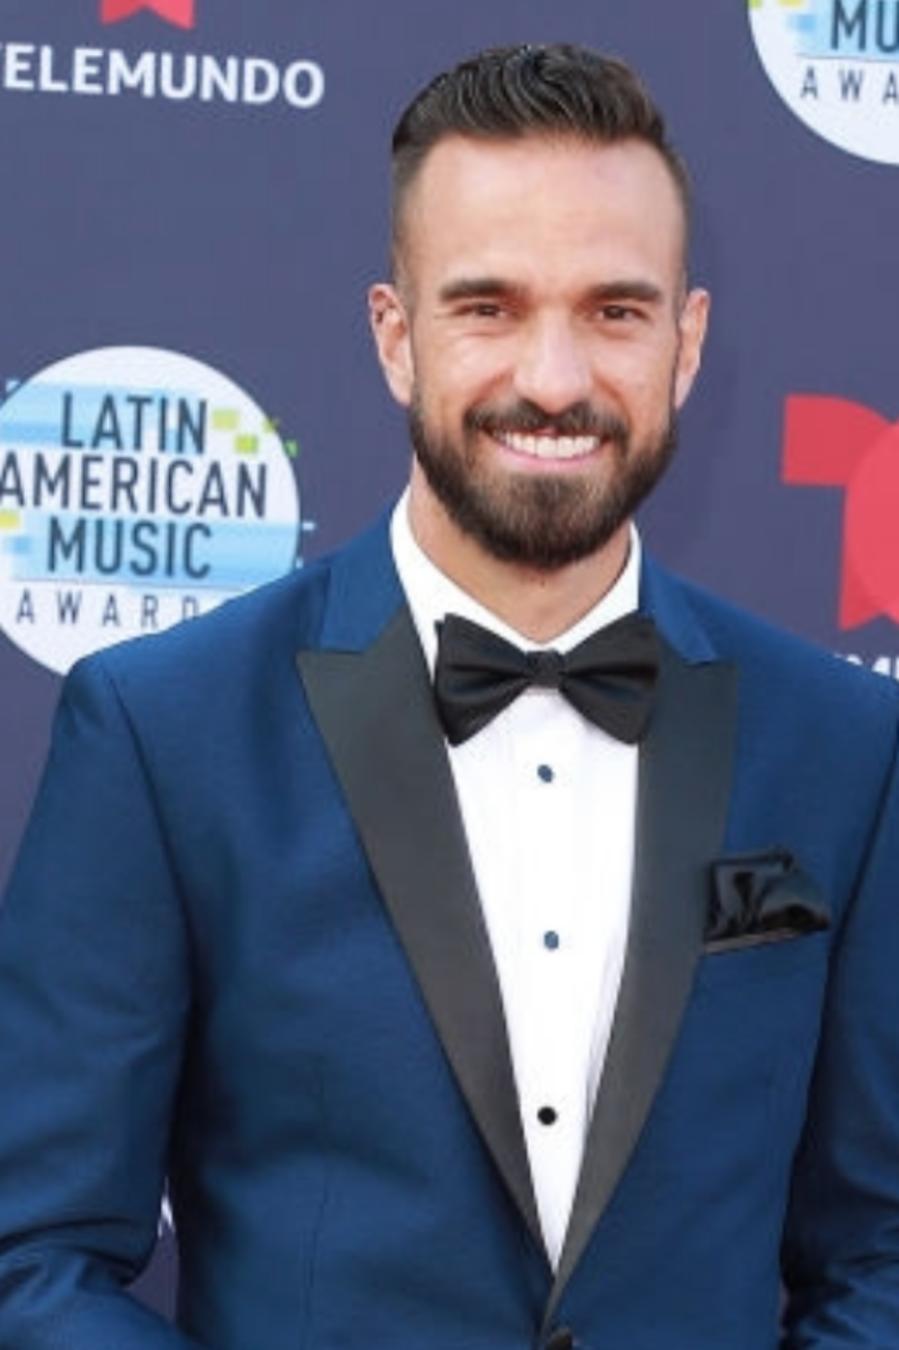 Erasmo Provenza Latin American Music Awards 2018